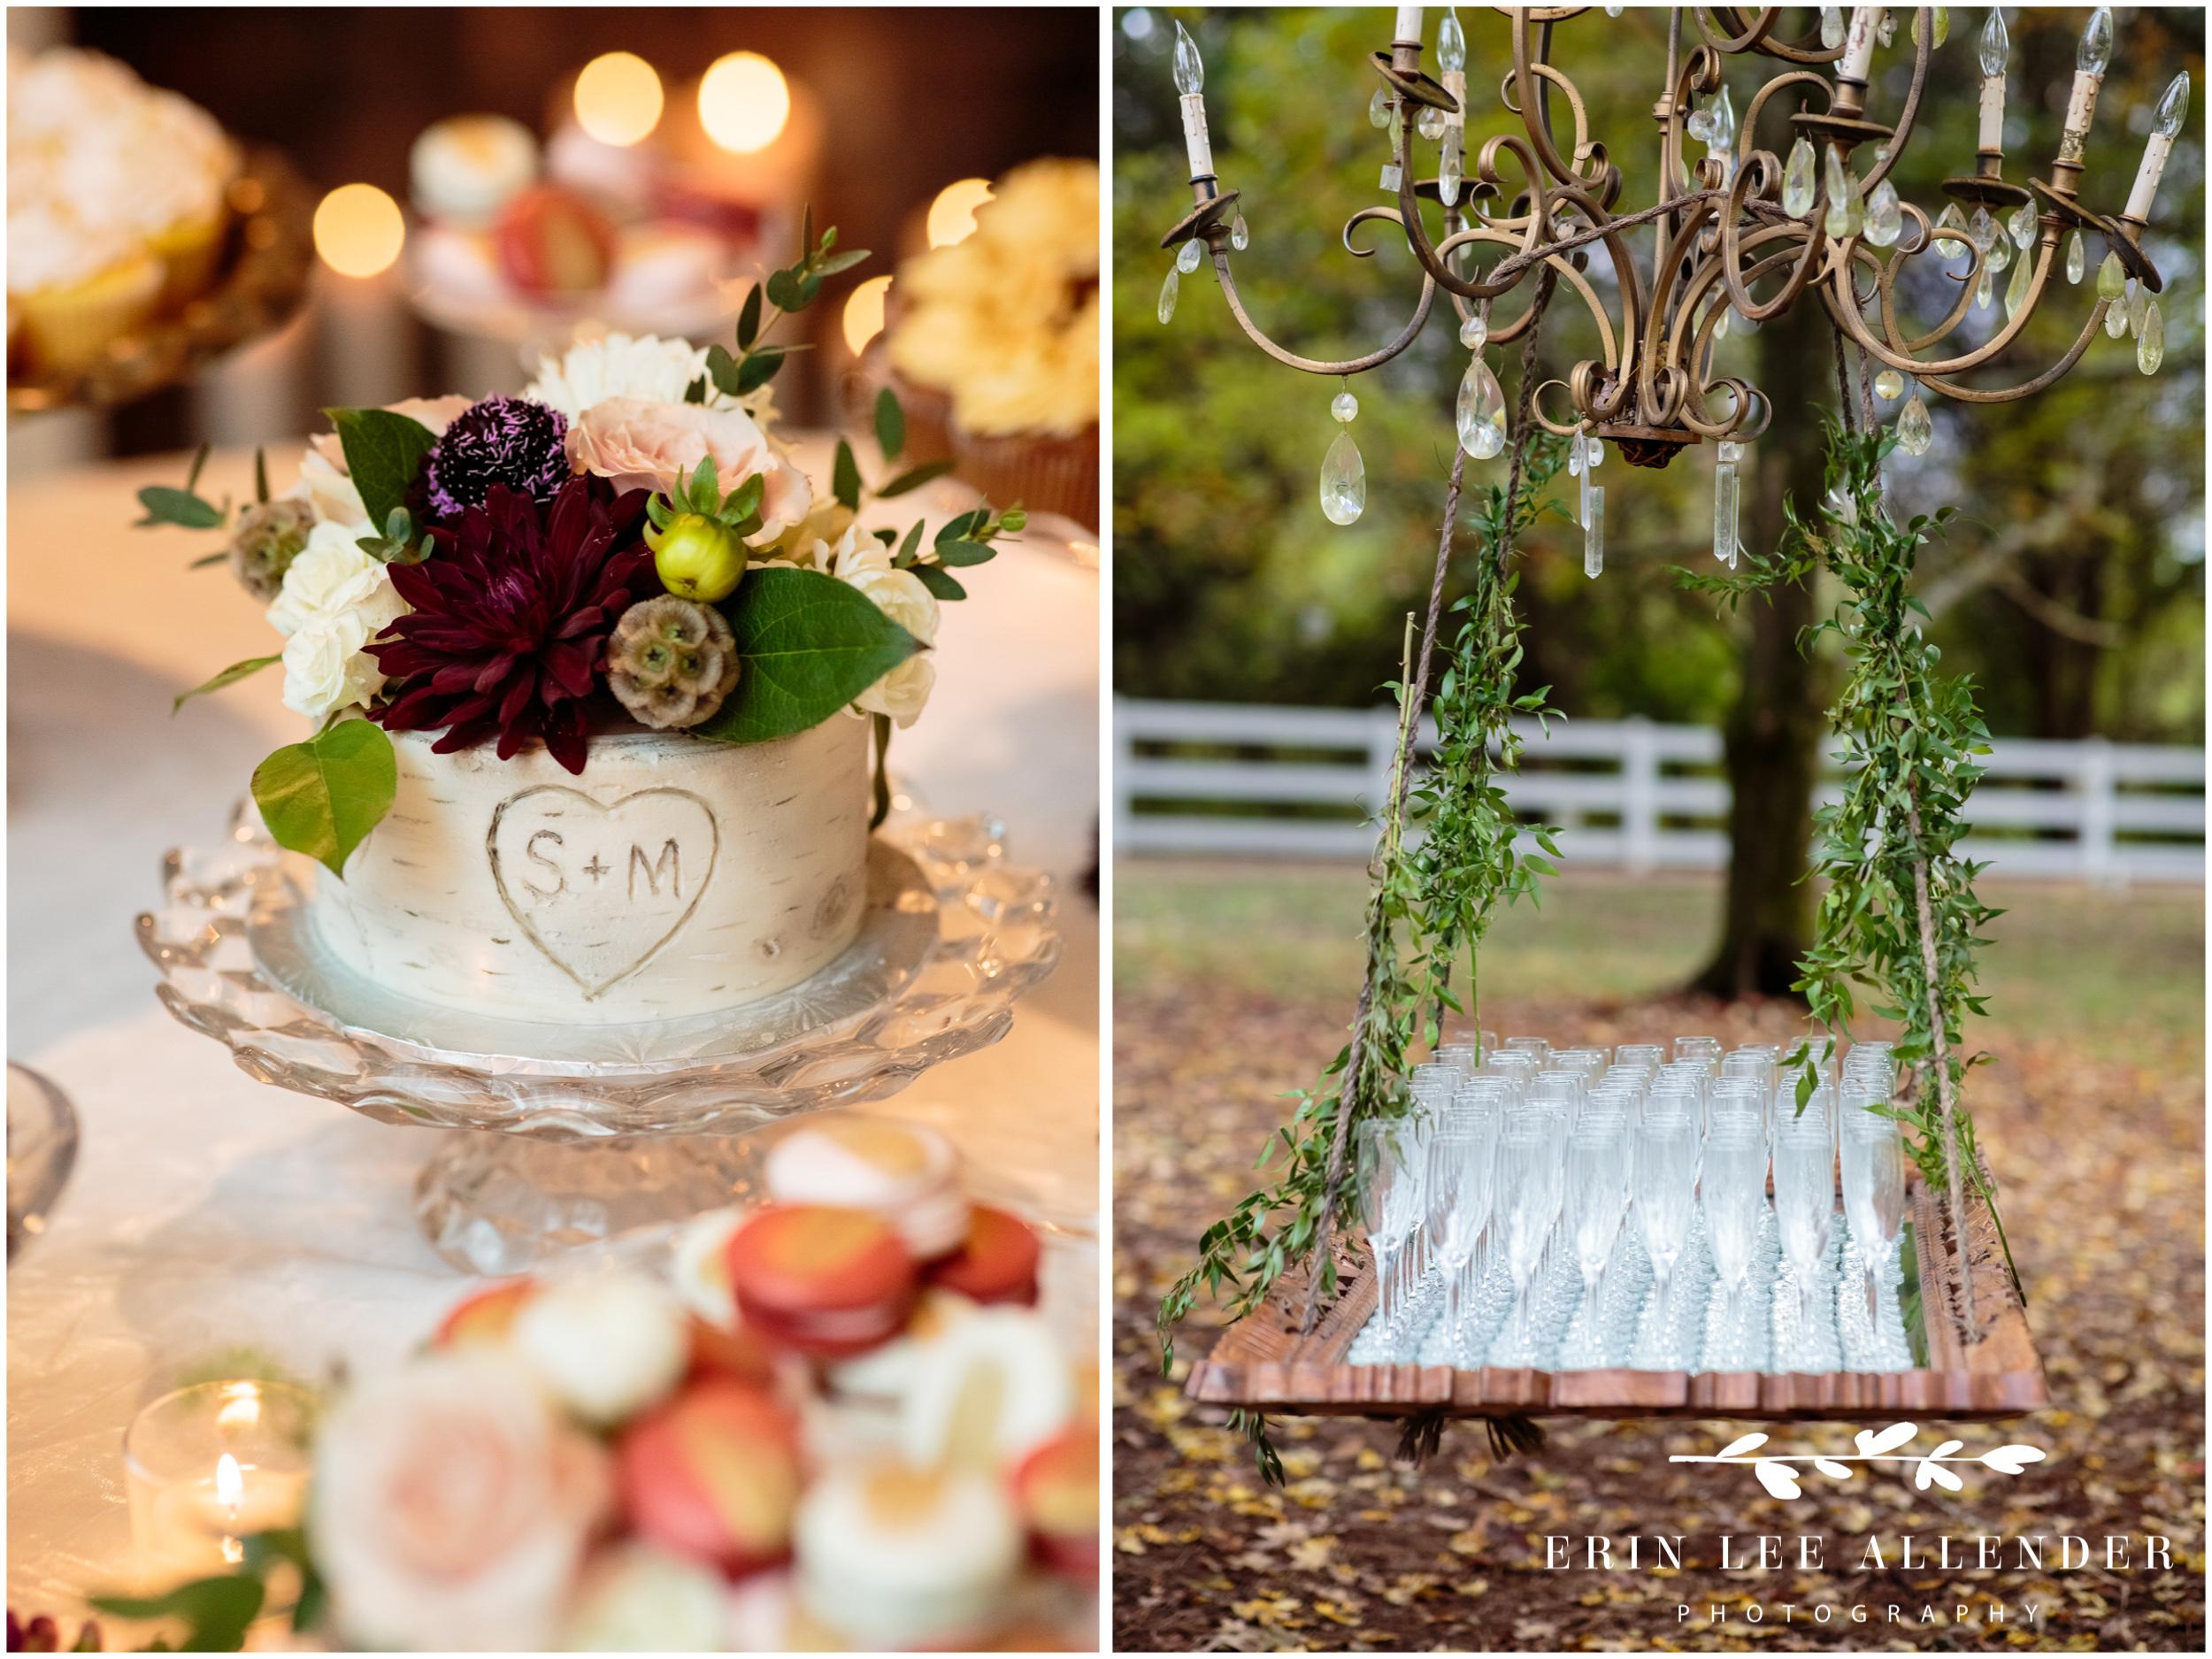 Birch-wedding-cake